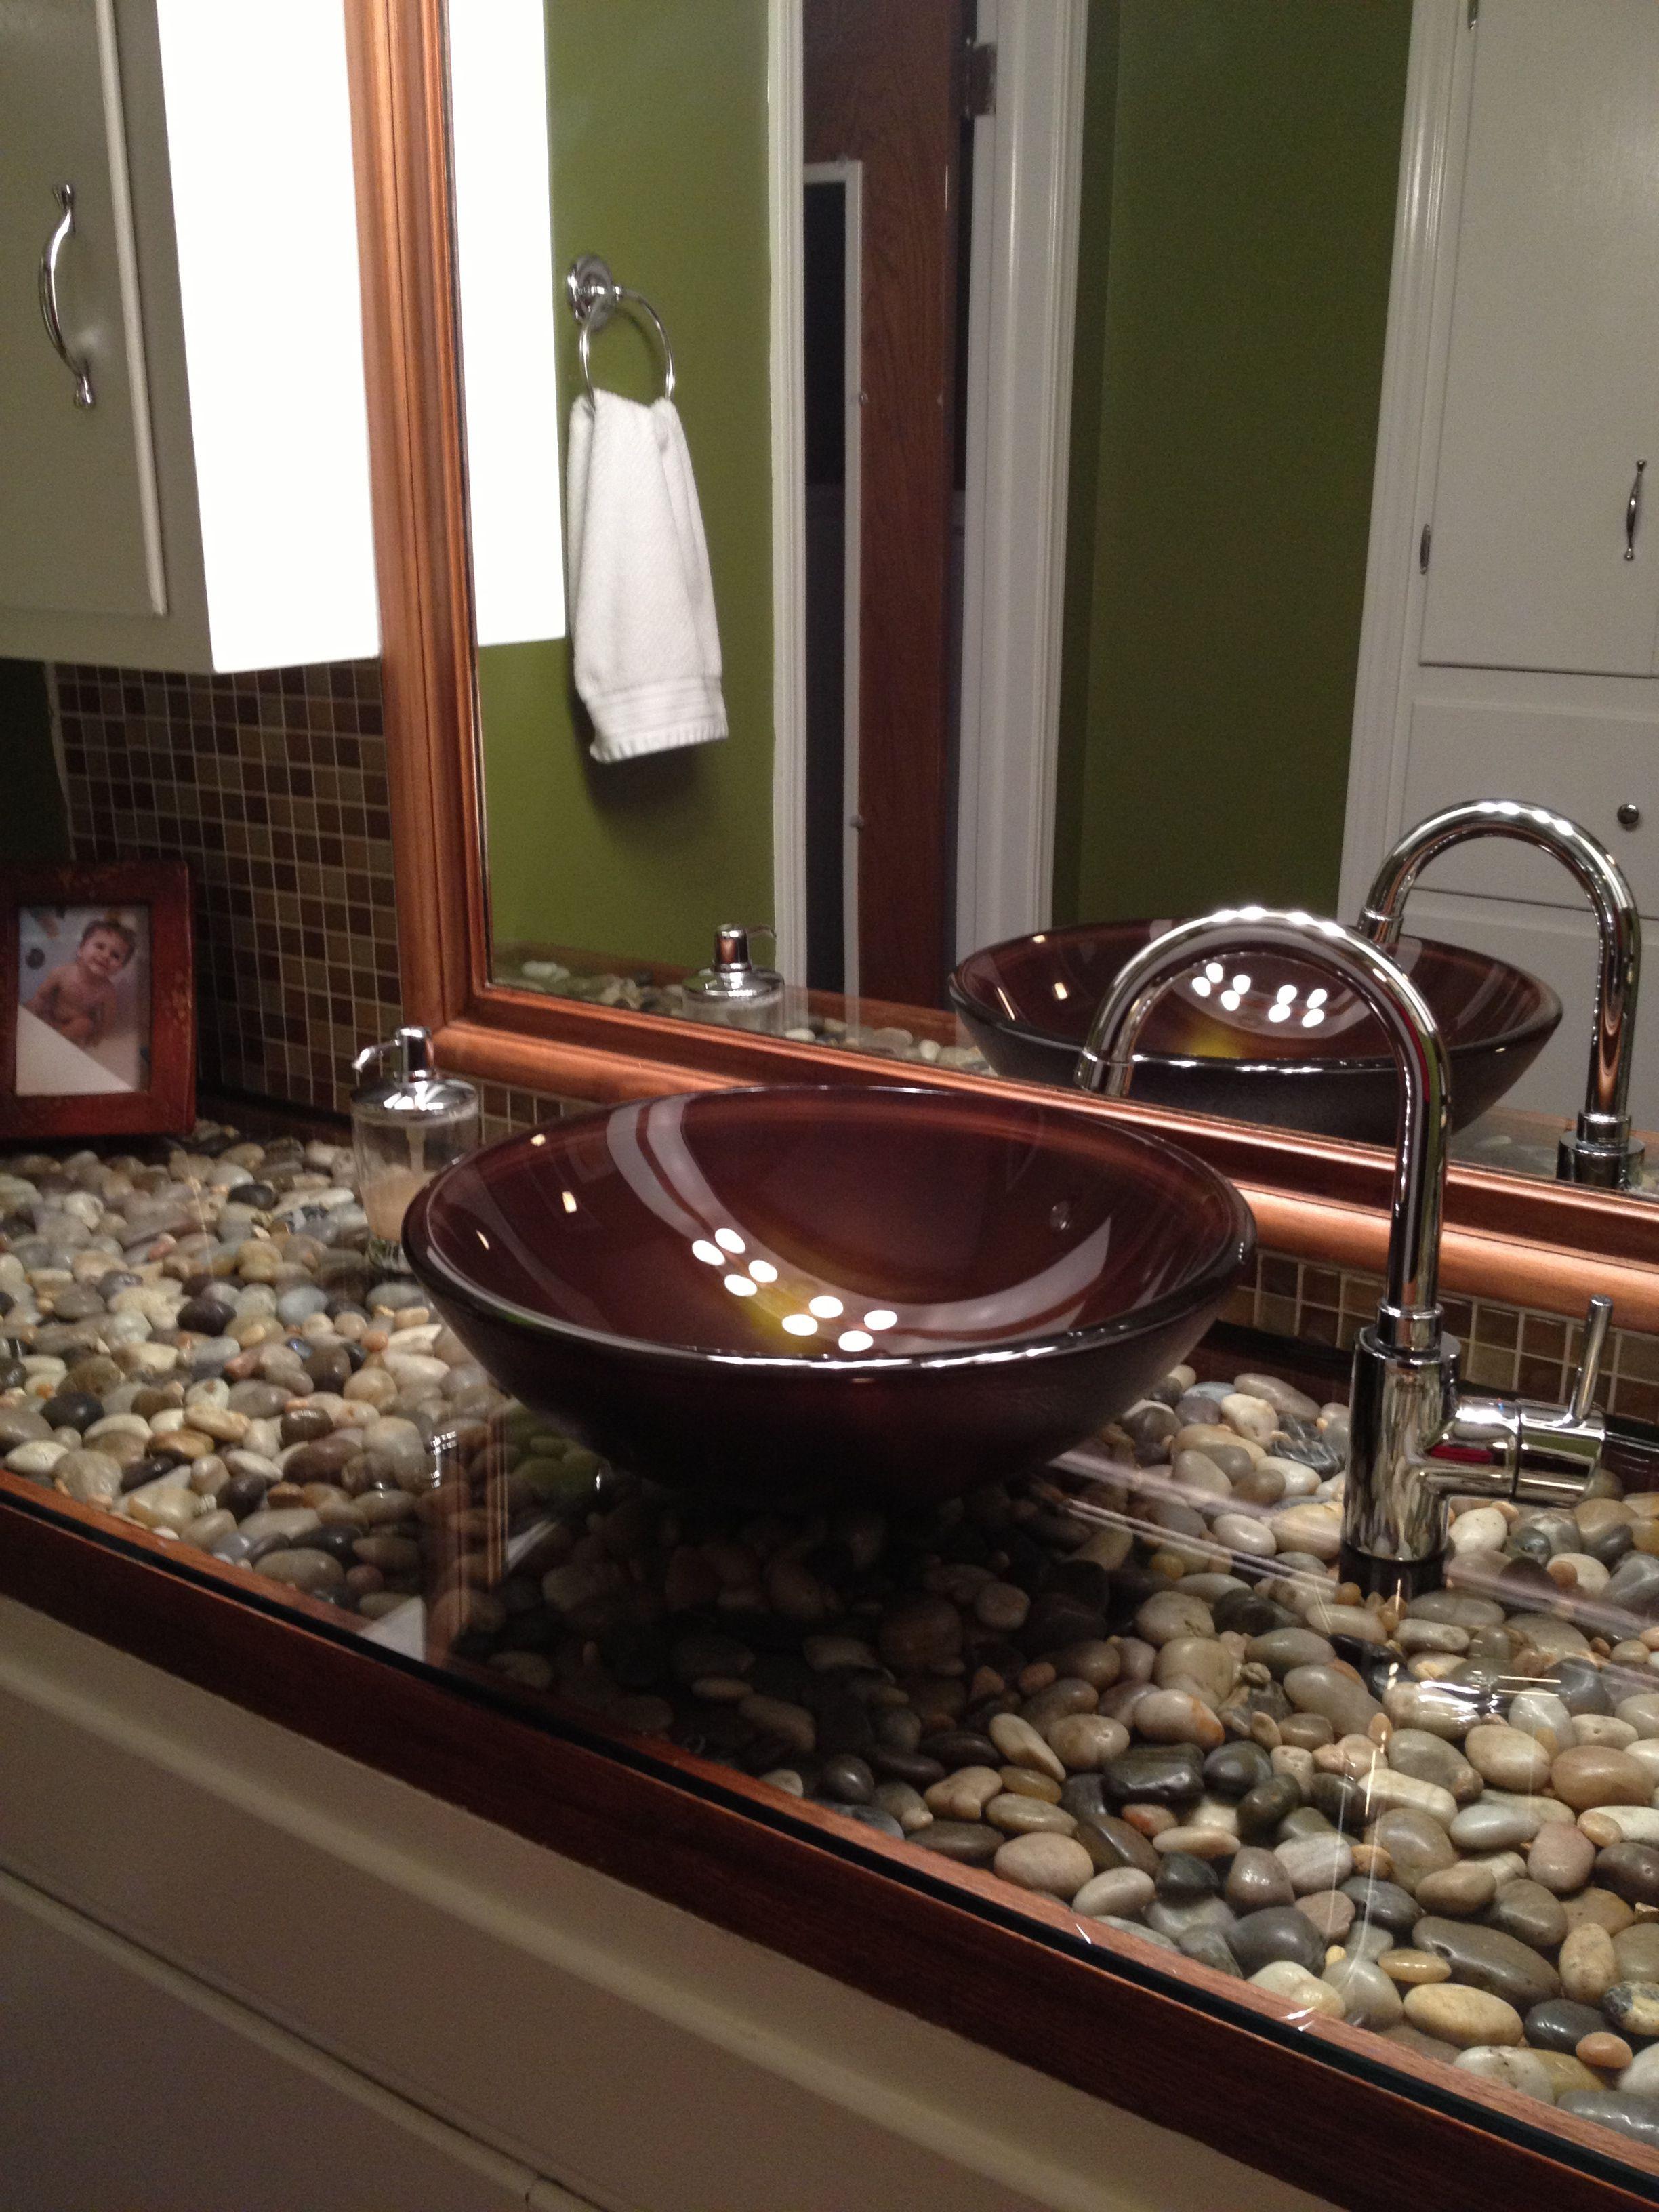 Bathroom River Rock Under Glass Plexiglass I Drop Sht All The